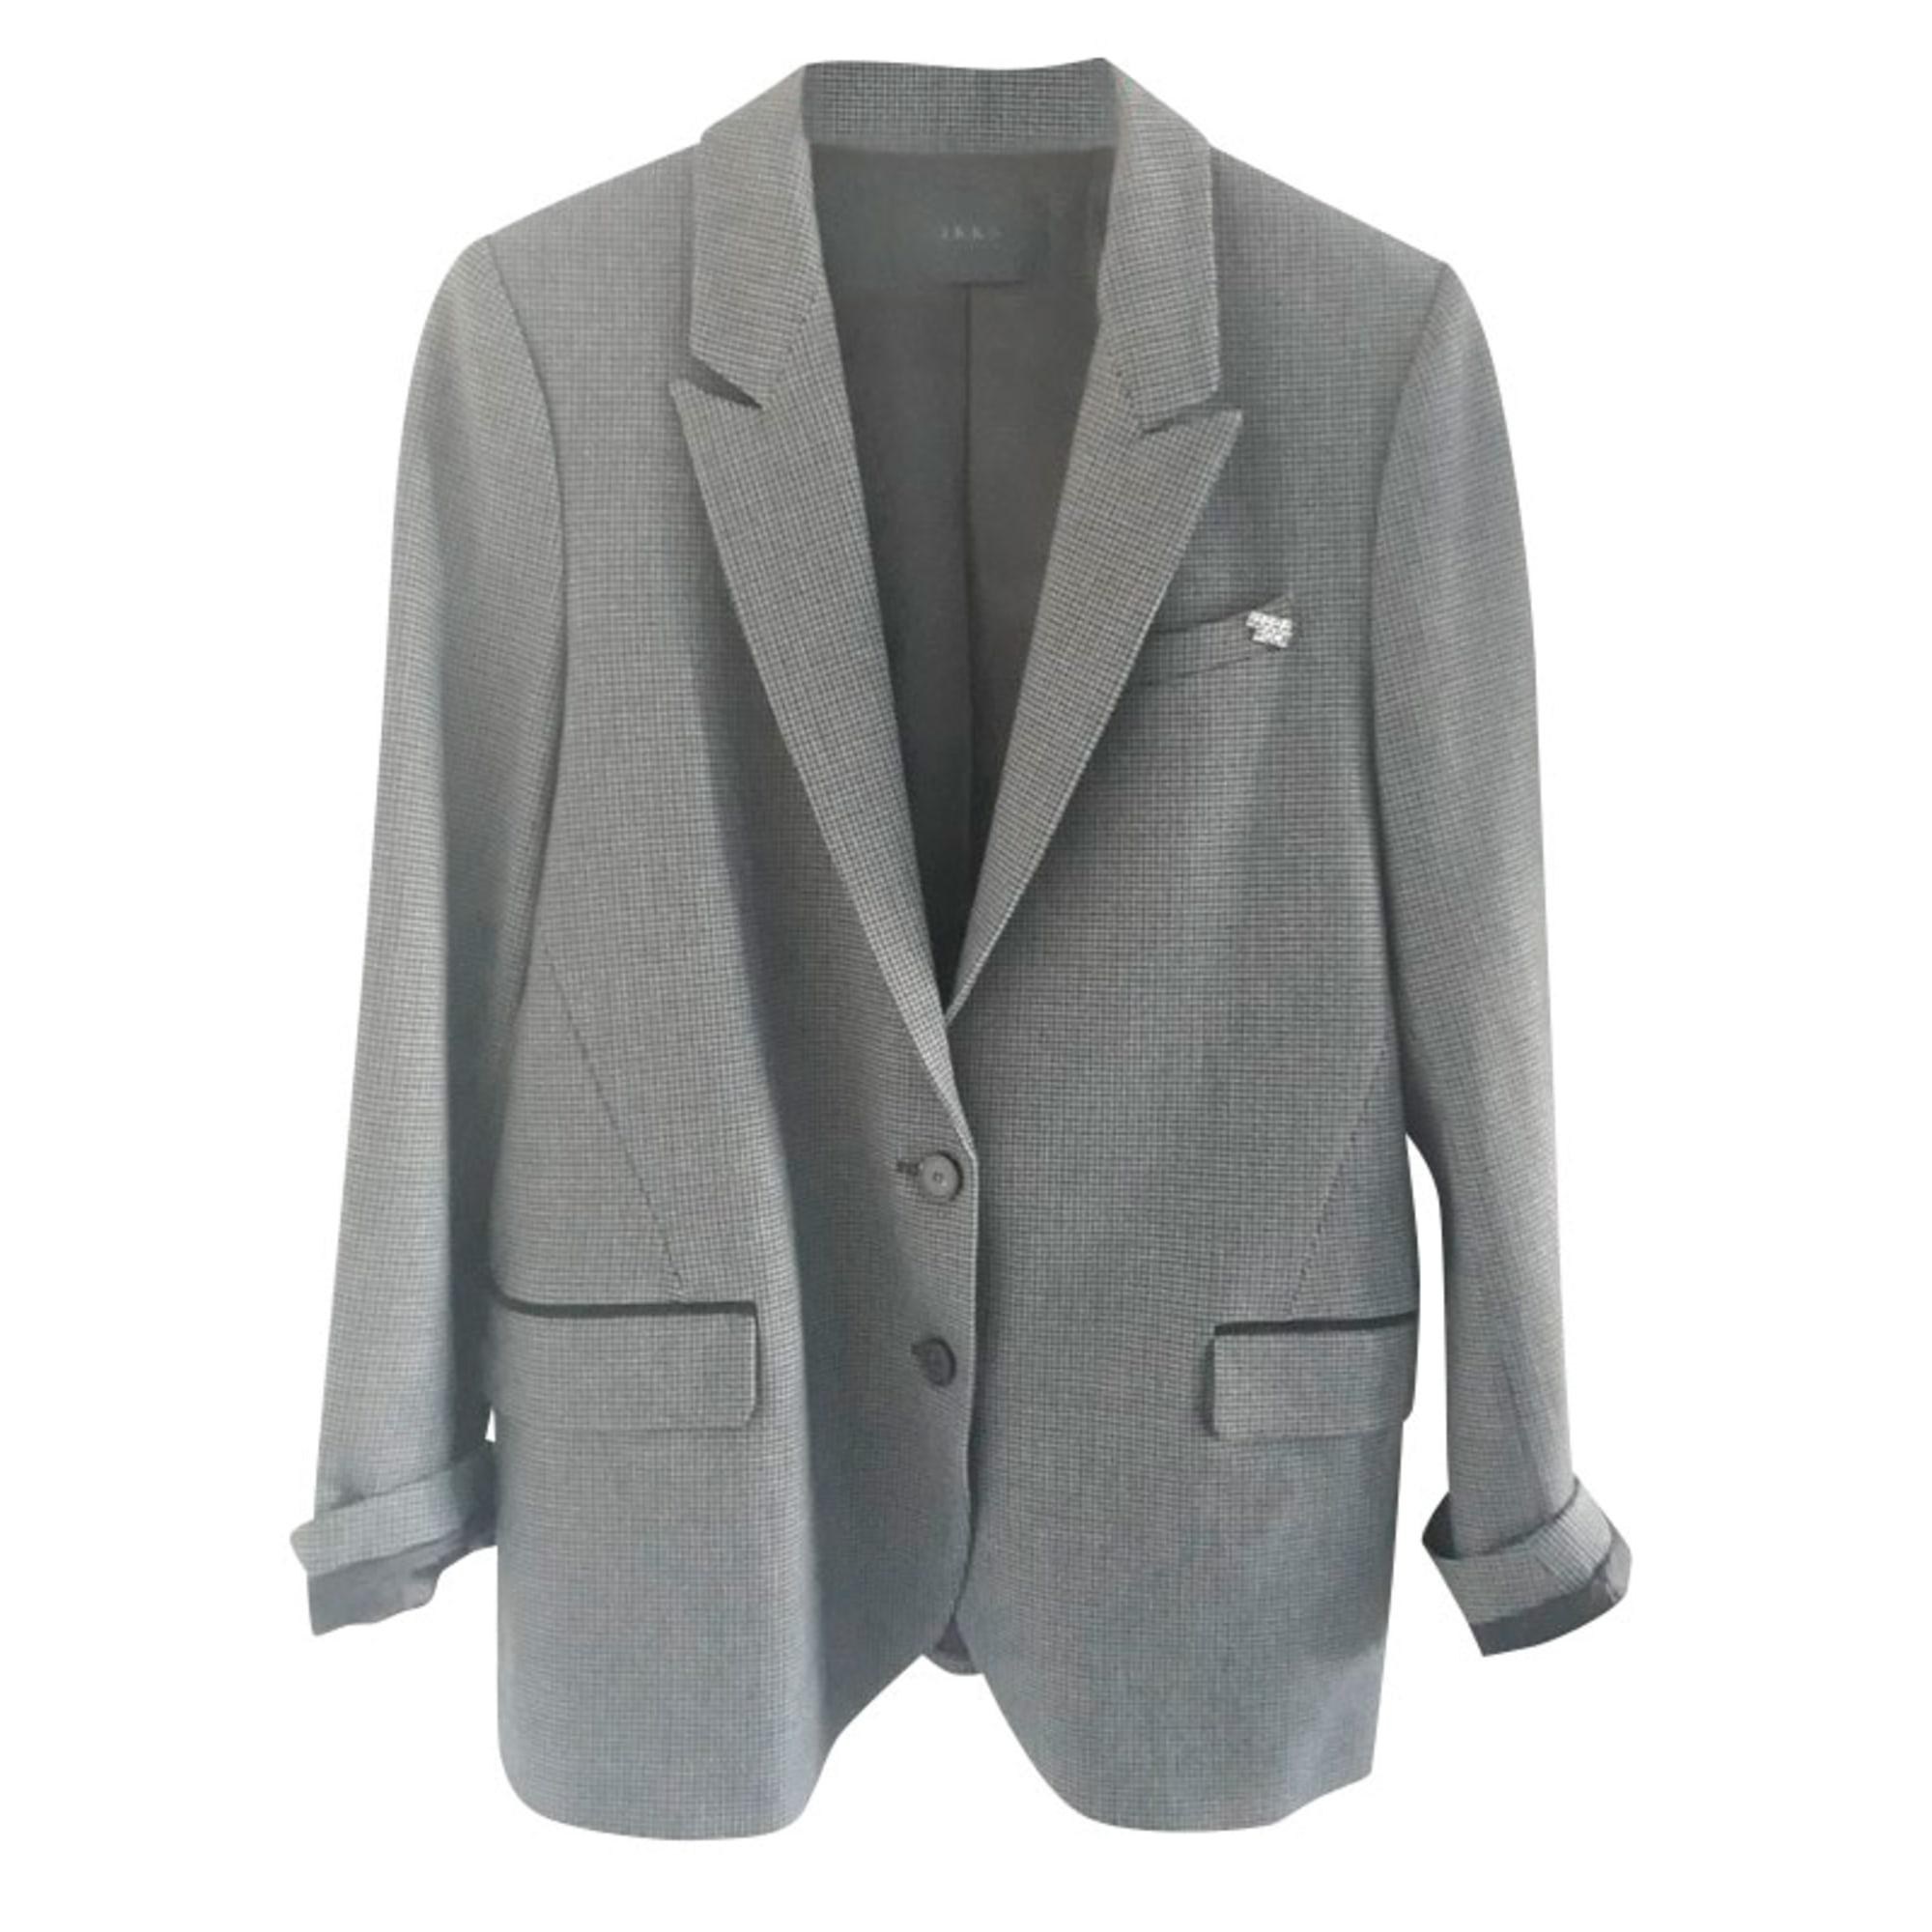 Blazer, veste tailleur IKKS Gris, anthracite